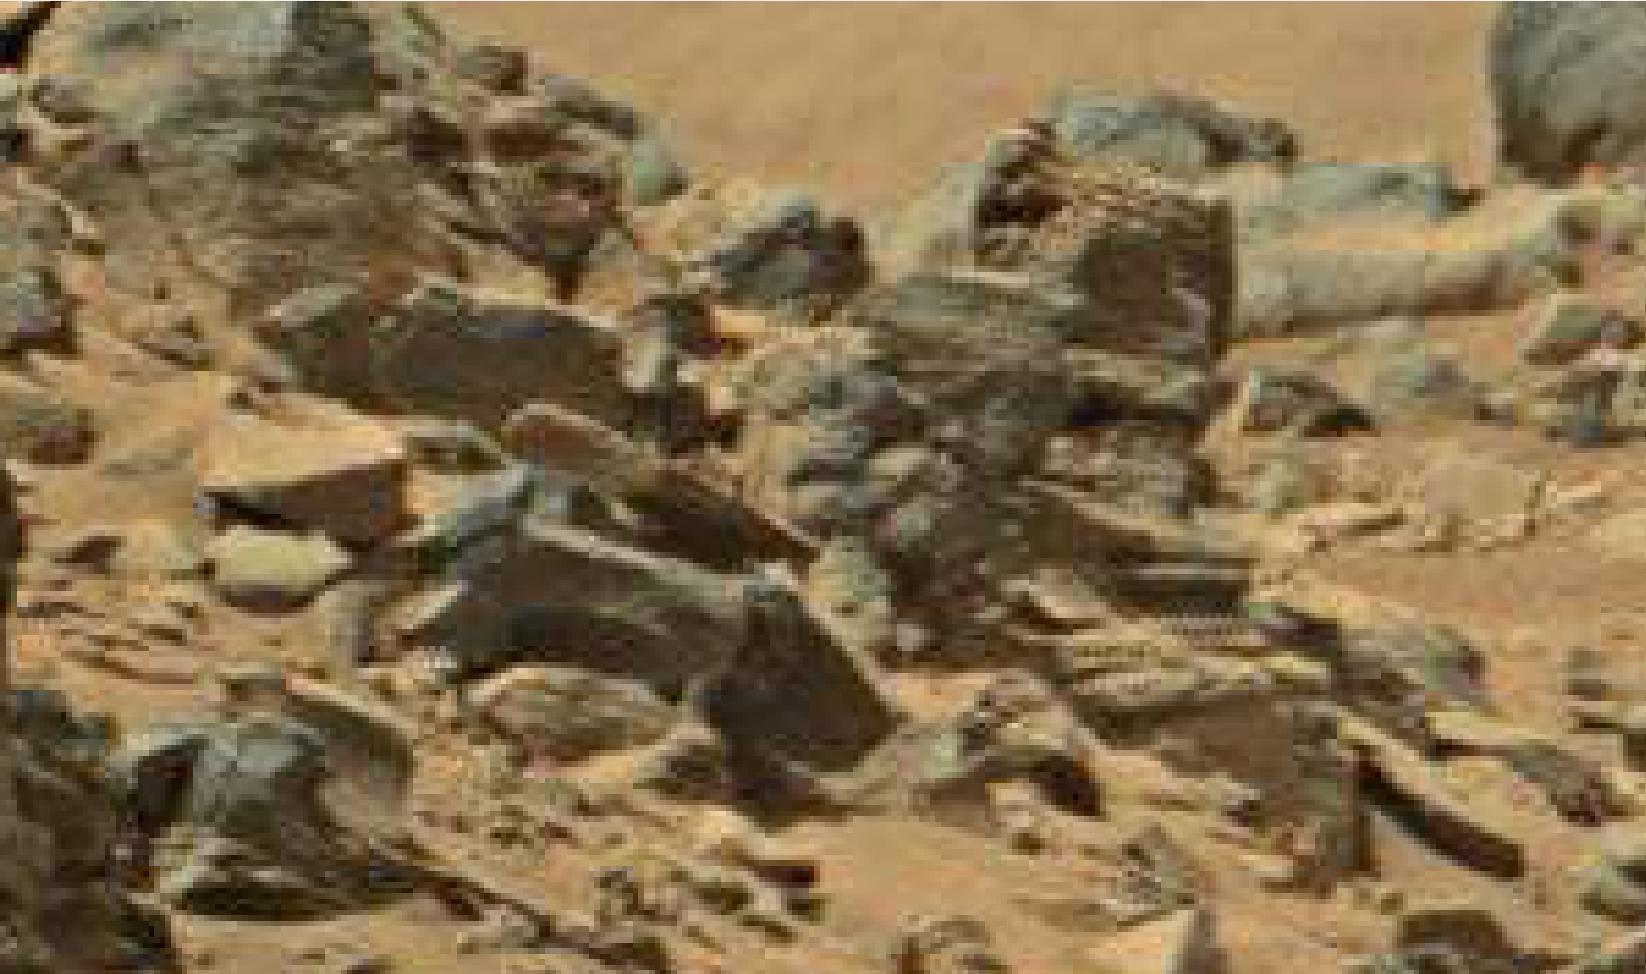 mars anomaly sol 710 skull statue was life on mars